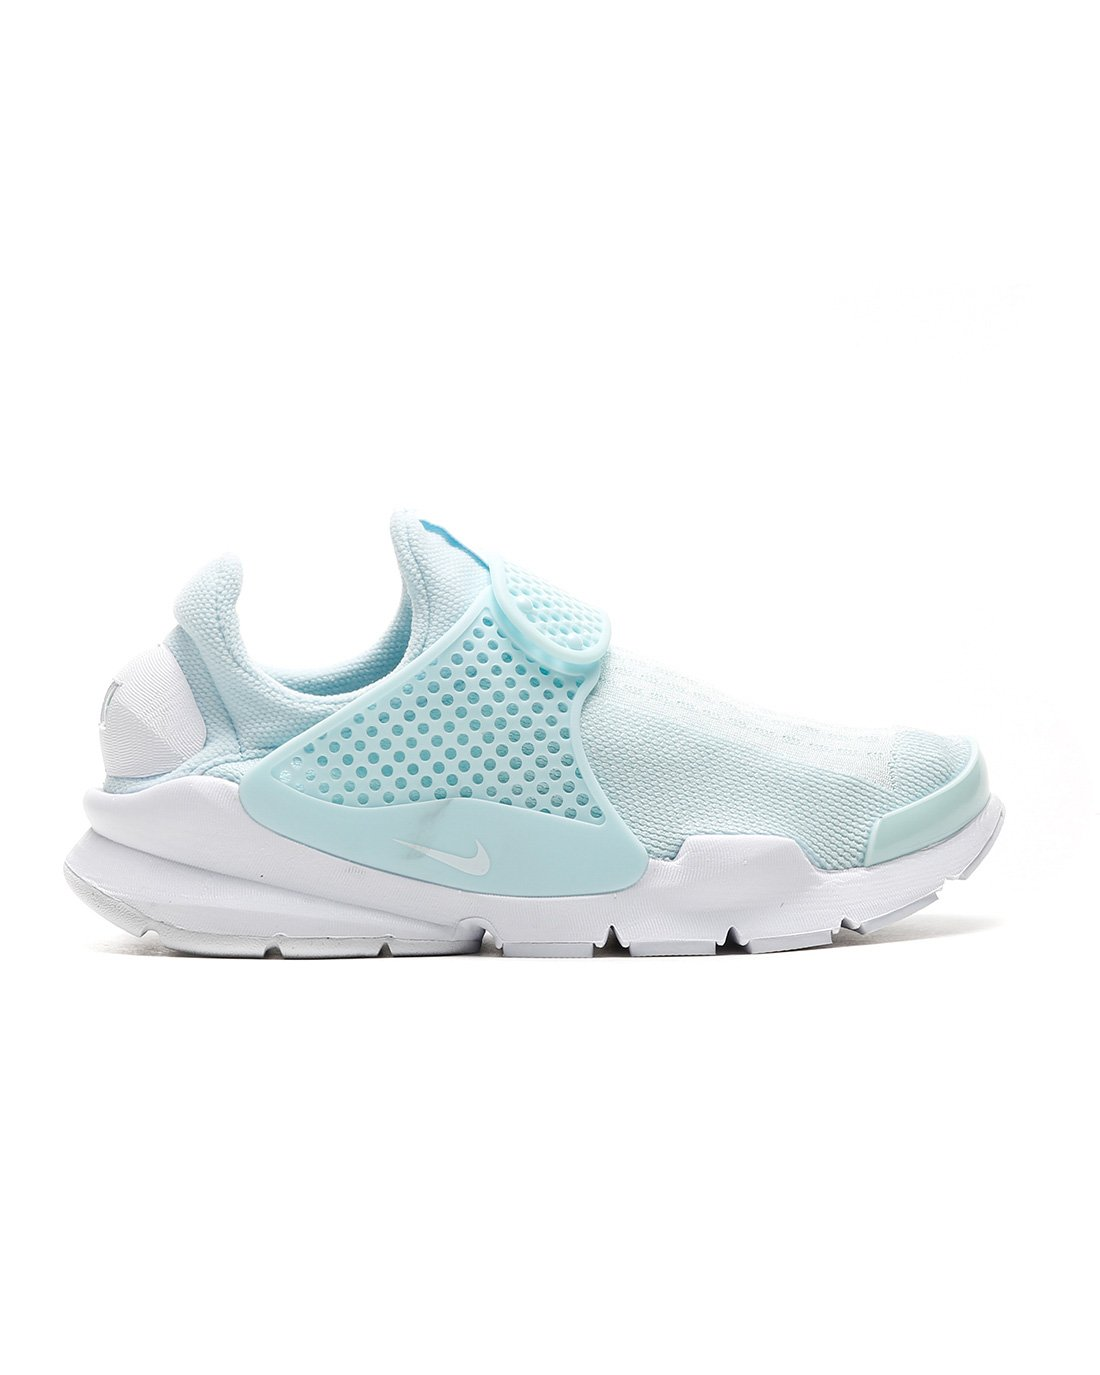 separation shoes f02ce ae410 Galleon - Nike Womens Sock Dart Glacier Blue White Running Shoe 10 Women US